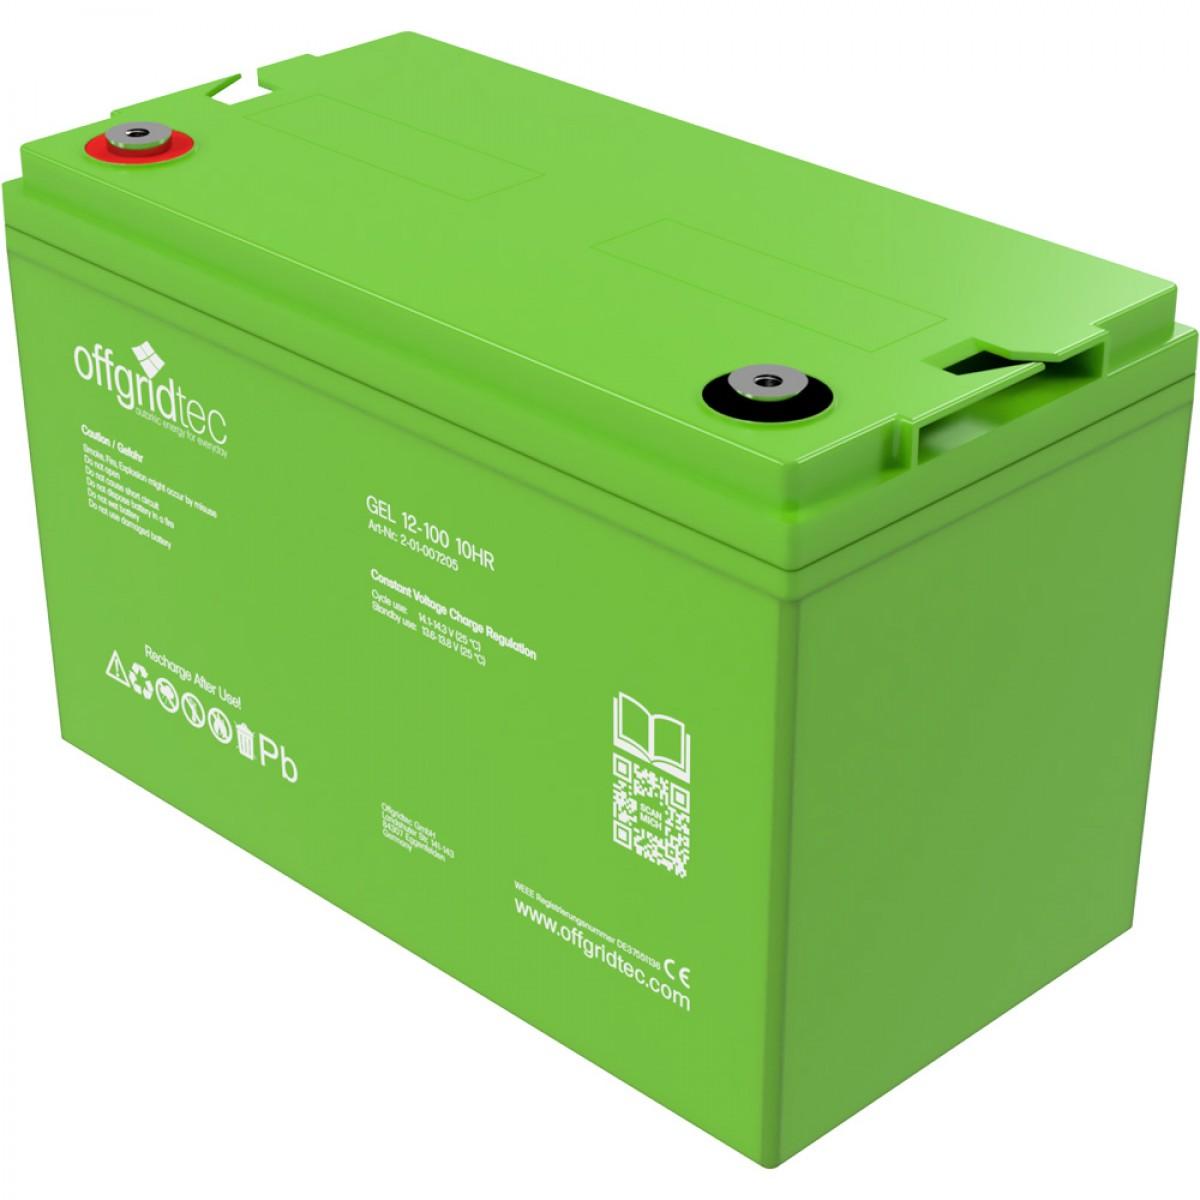 Offgridtec Gelbatterie 12V 100Ah 2